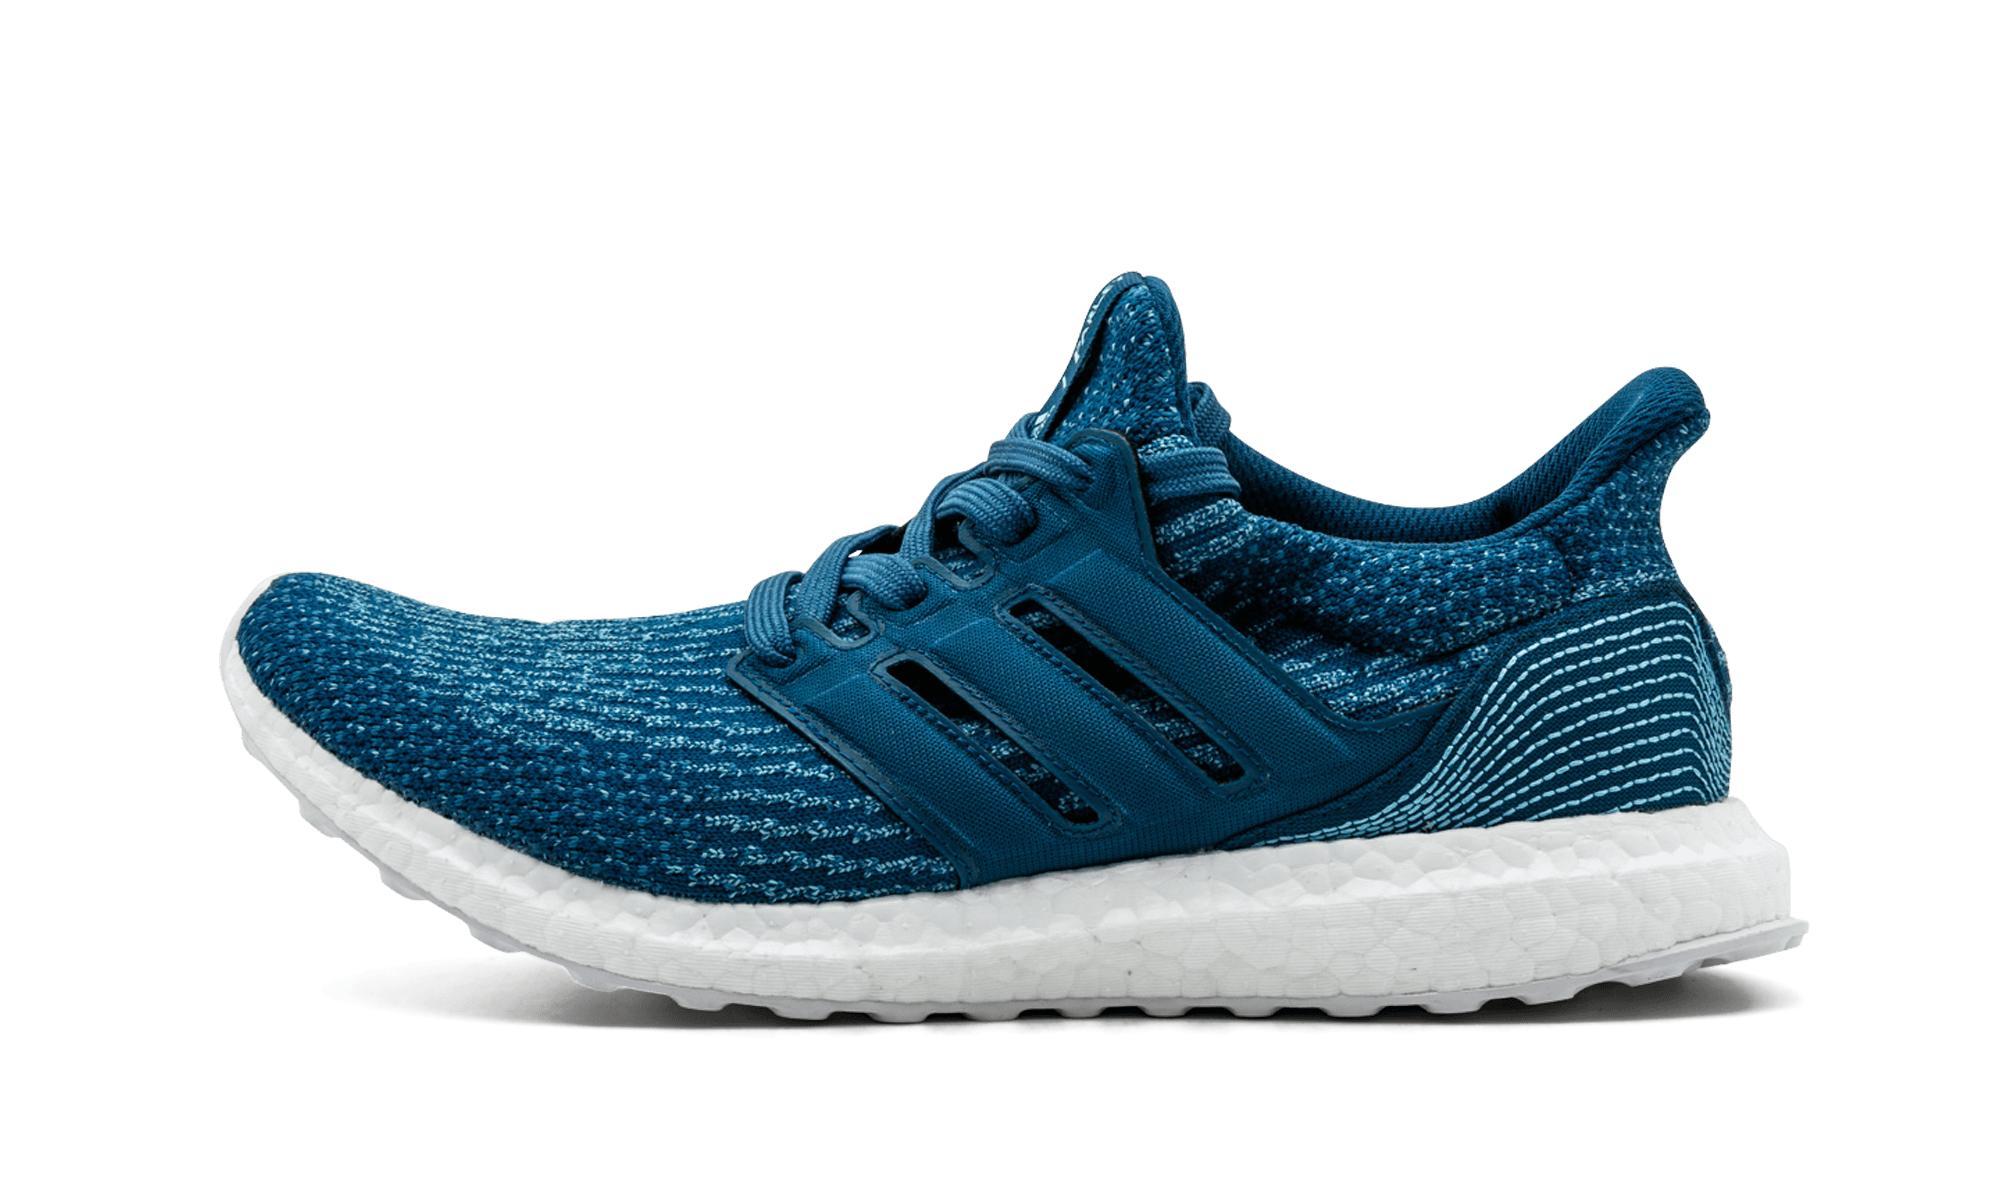 20c8148ec80 Adidas - Ultraboost Parley Mens Night Navy intense Blue for Men - Lyst.  View fullscreen